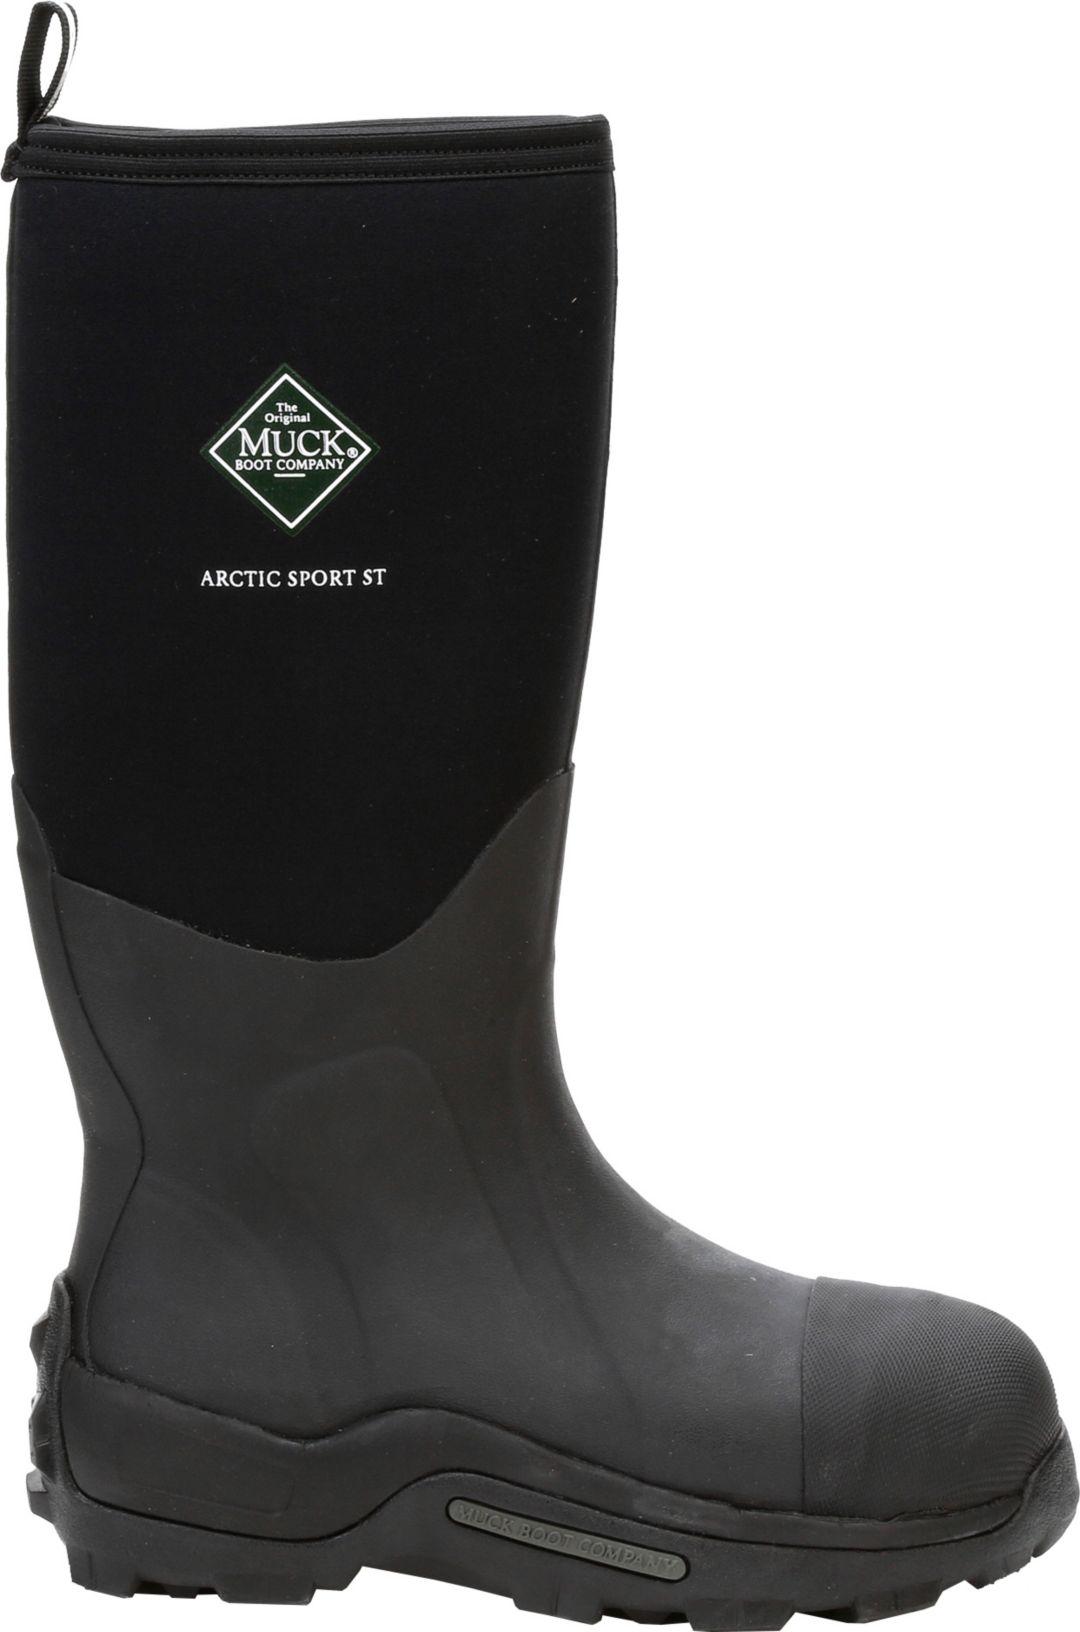 fa232a1a594 Muck Boots Men's Arctic Sport Steel Toe Waterproof Work Boots